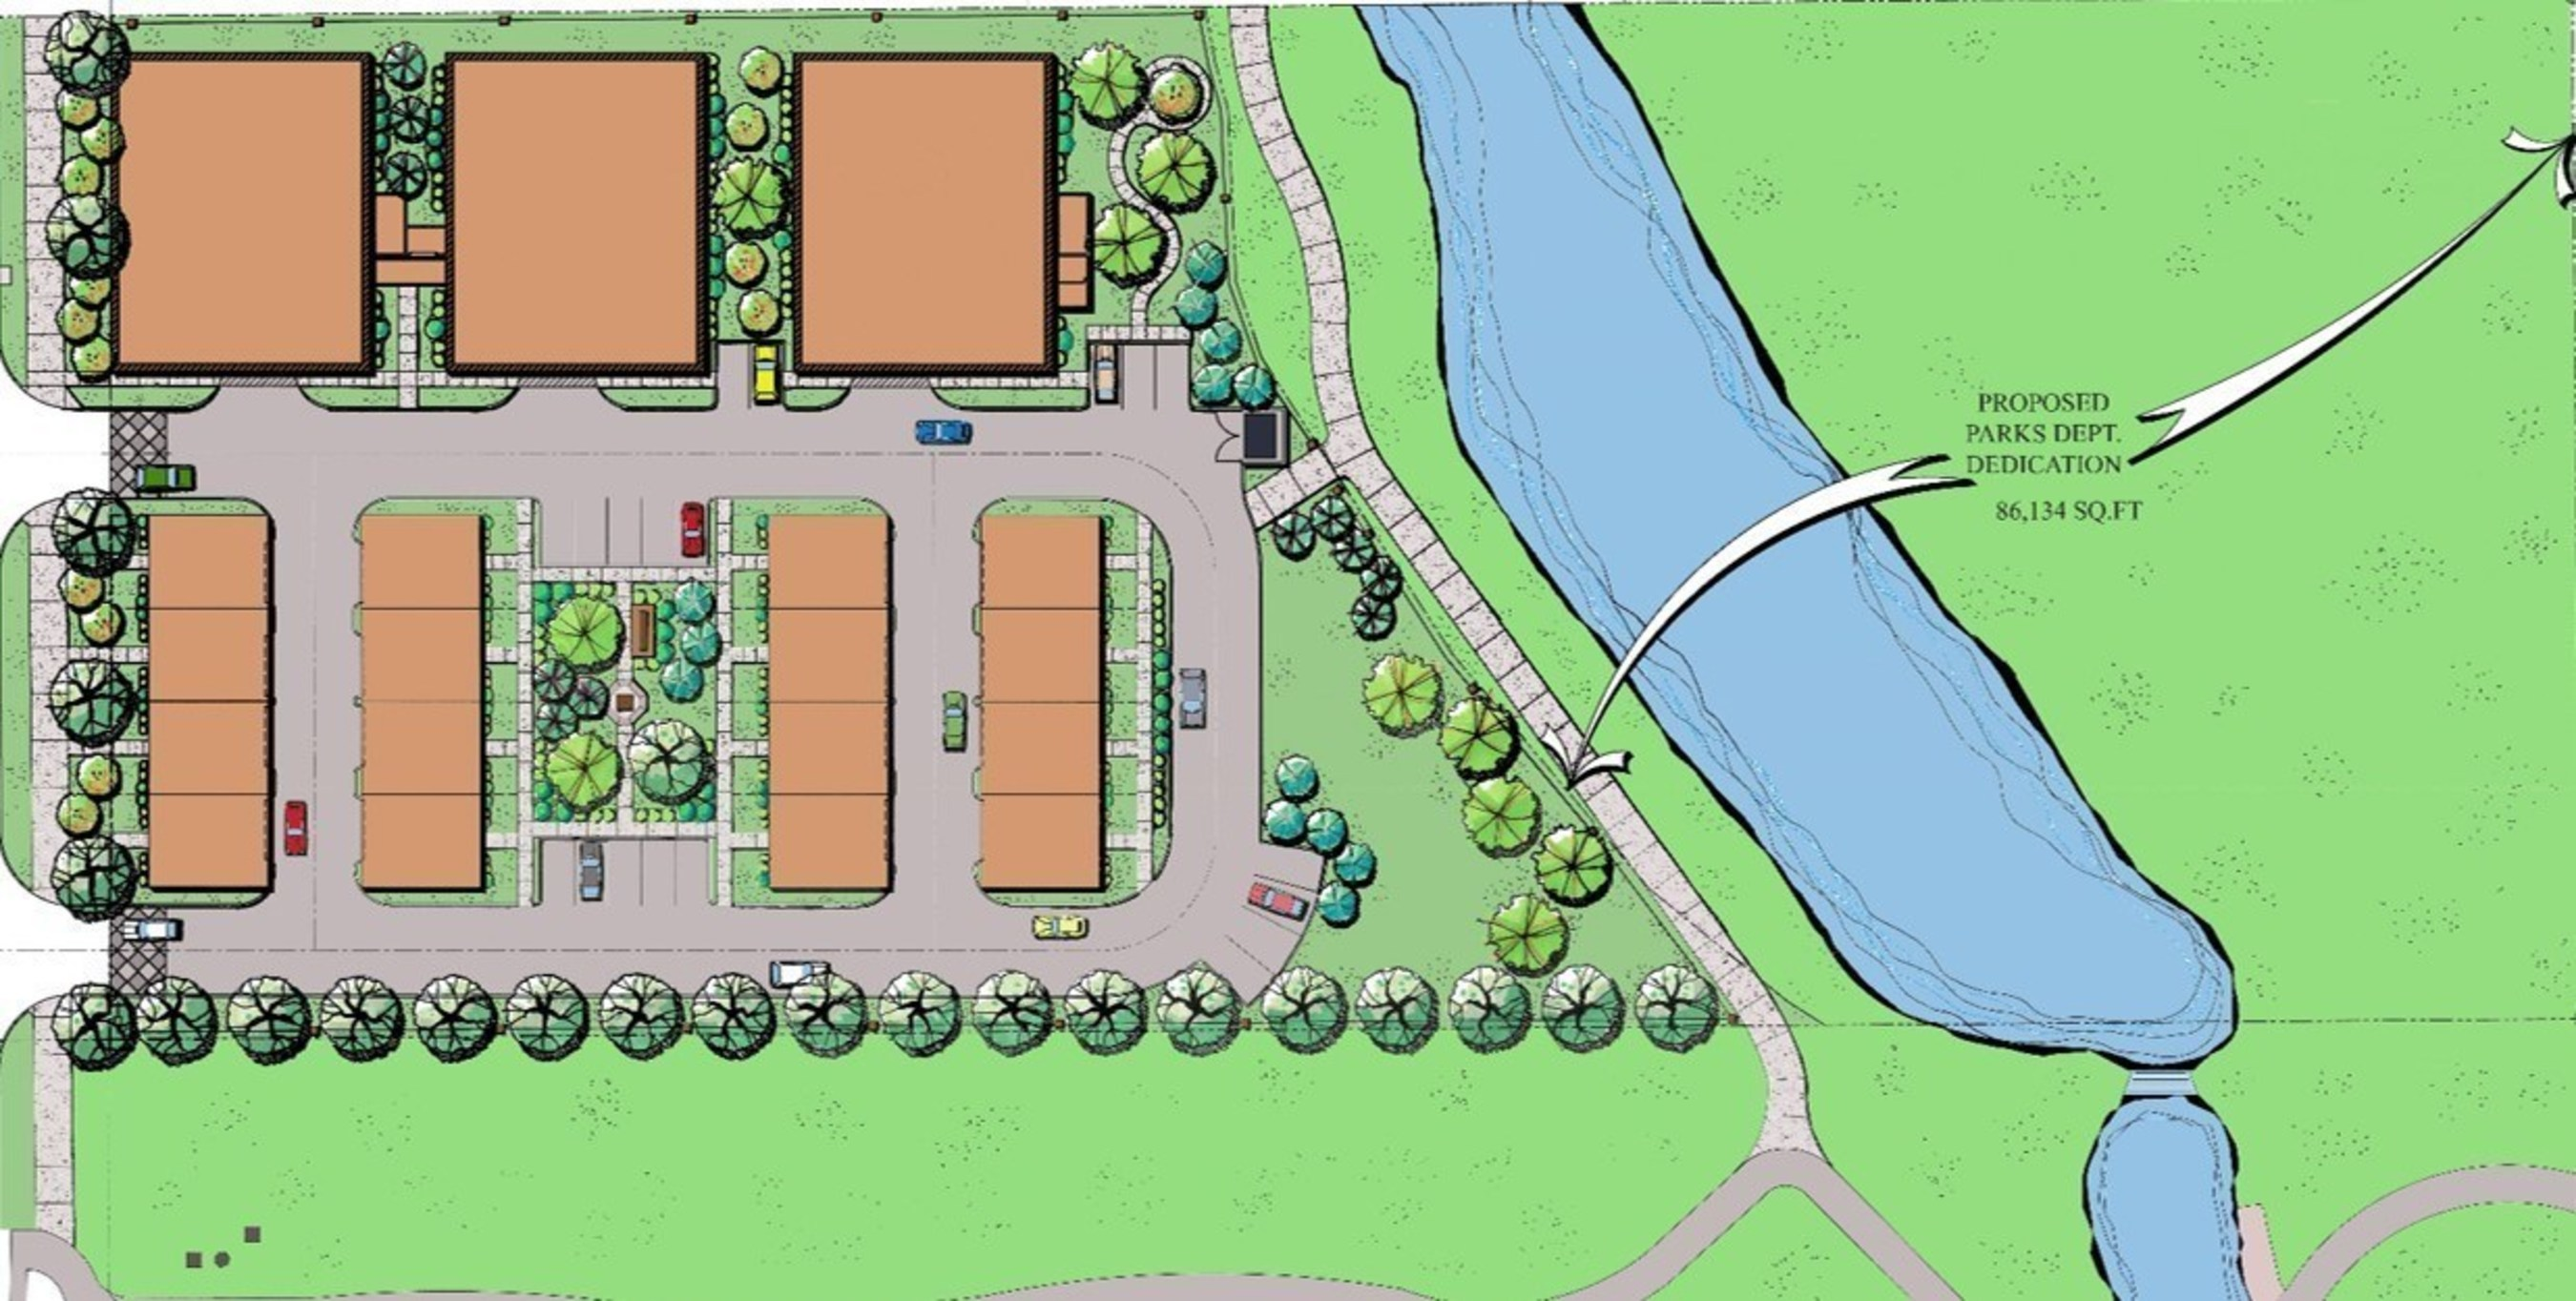 Luxury Condominium Flats, Coming Soon to Richardson